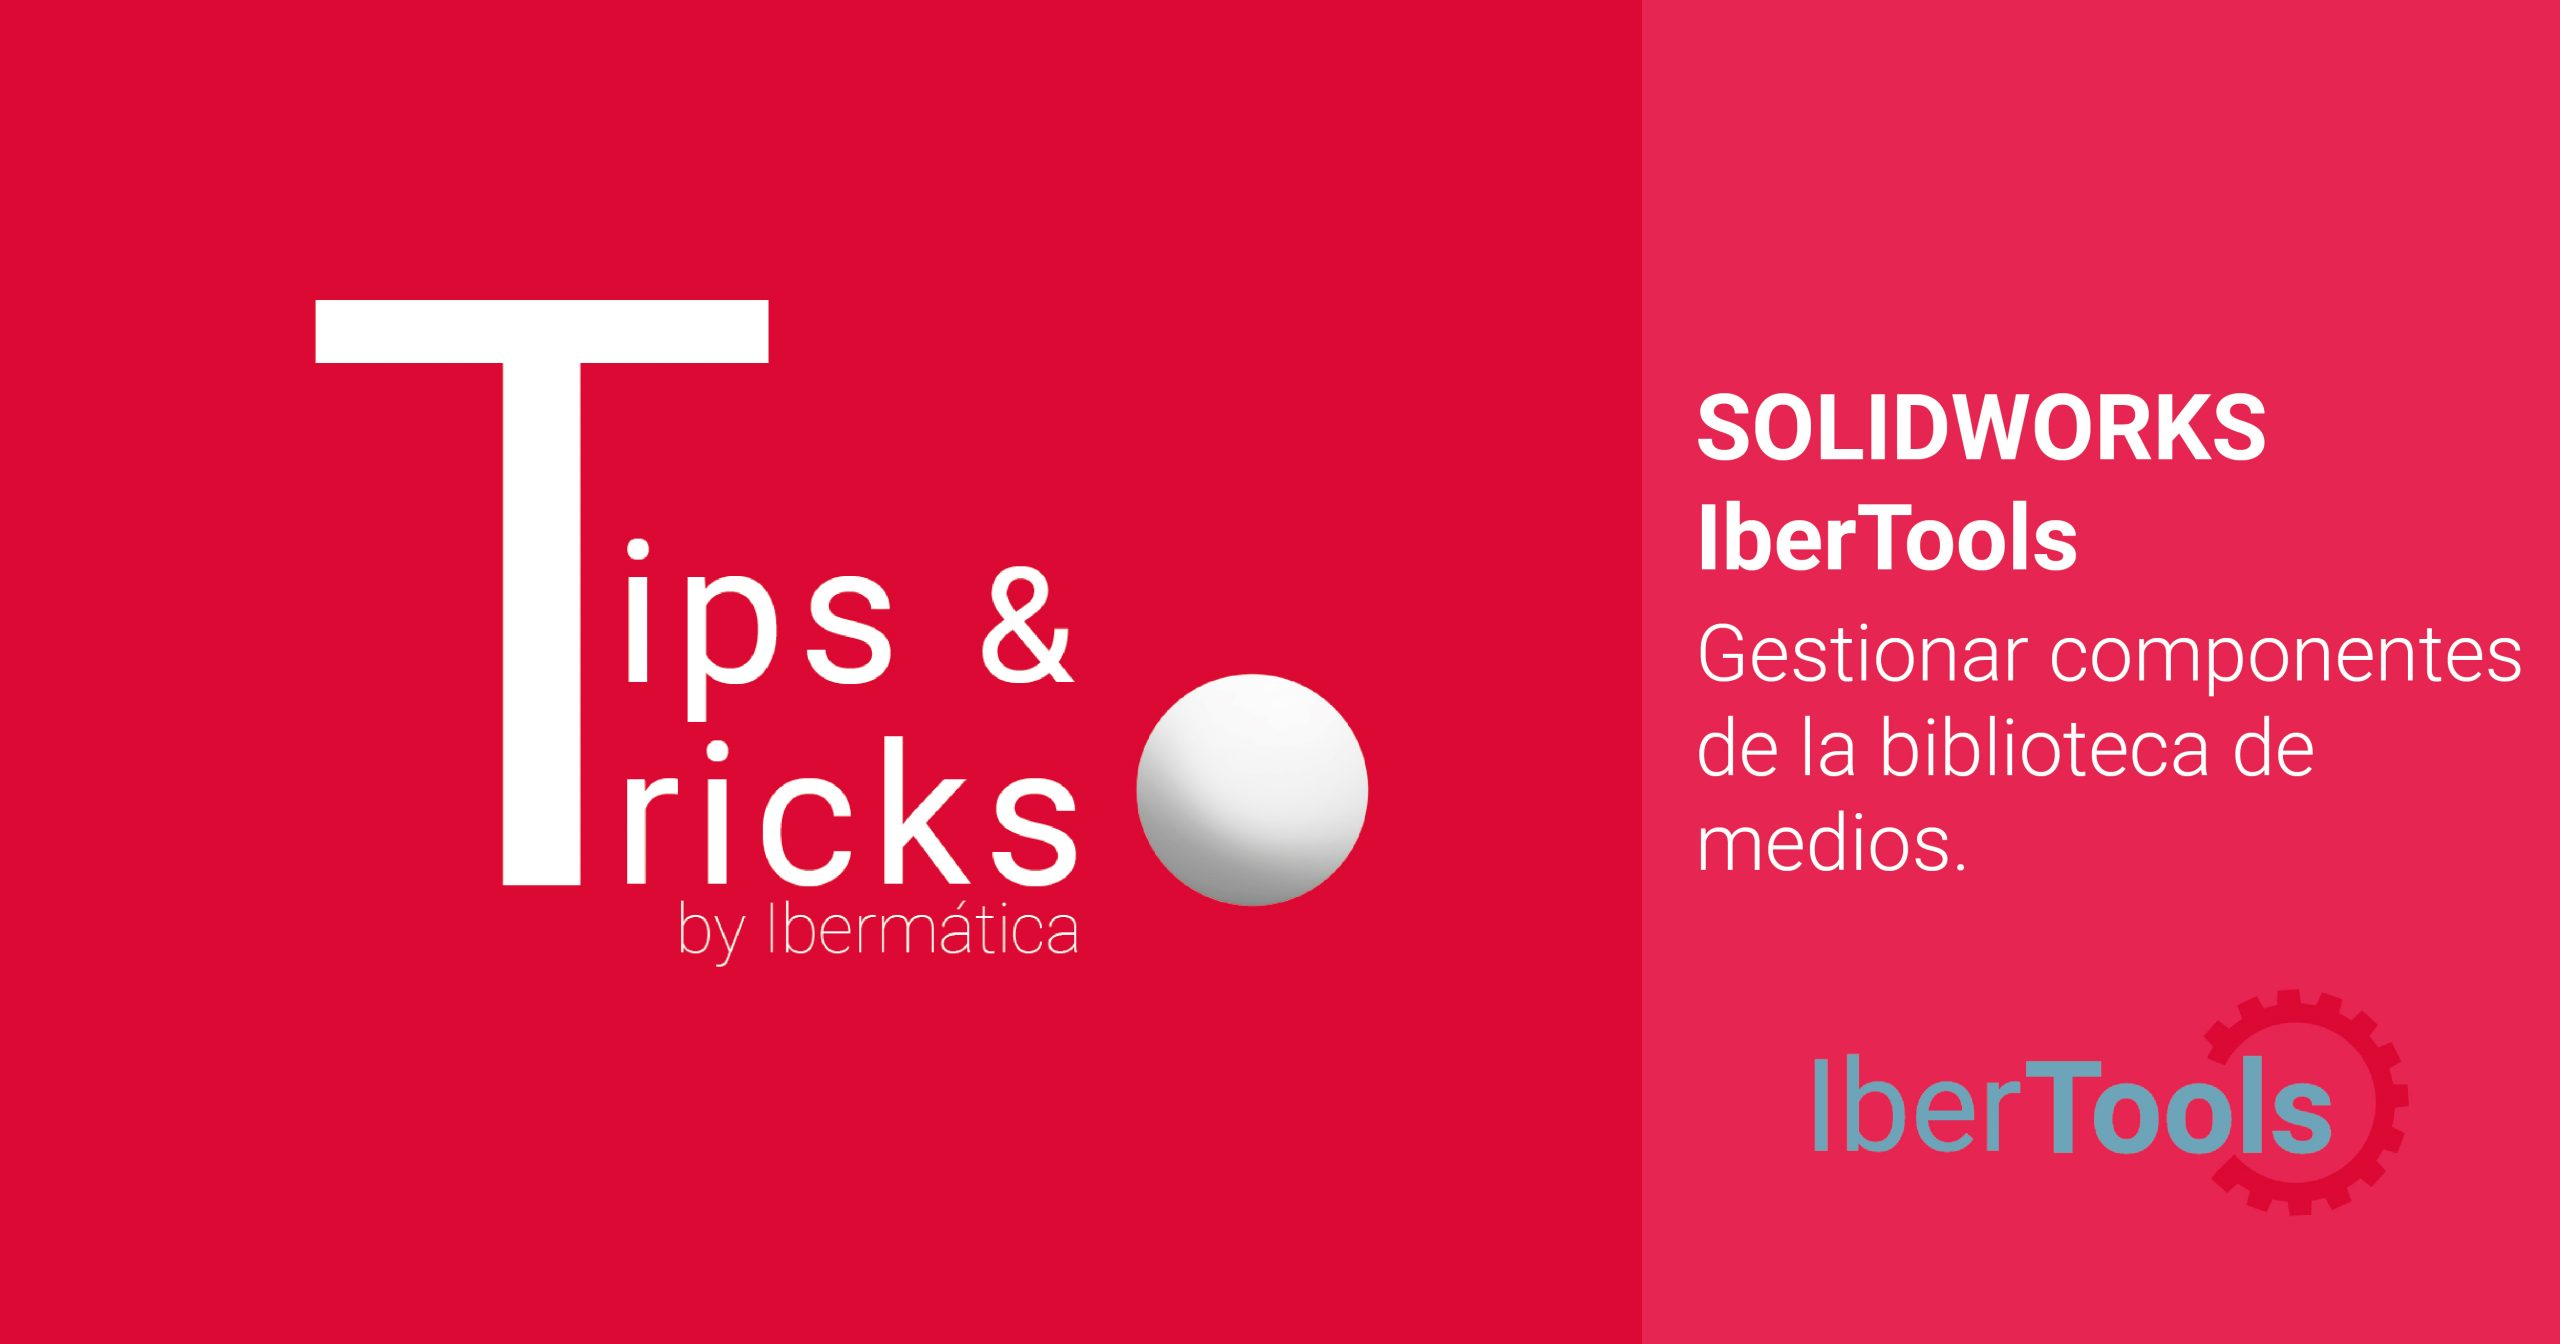 SOLIDWORKS TIPS&TRICKS - Gestionar componentes de la biblioteca de medios de SOLIDWORKS | IberTools